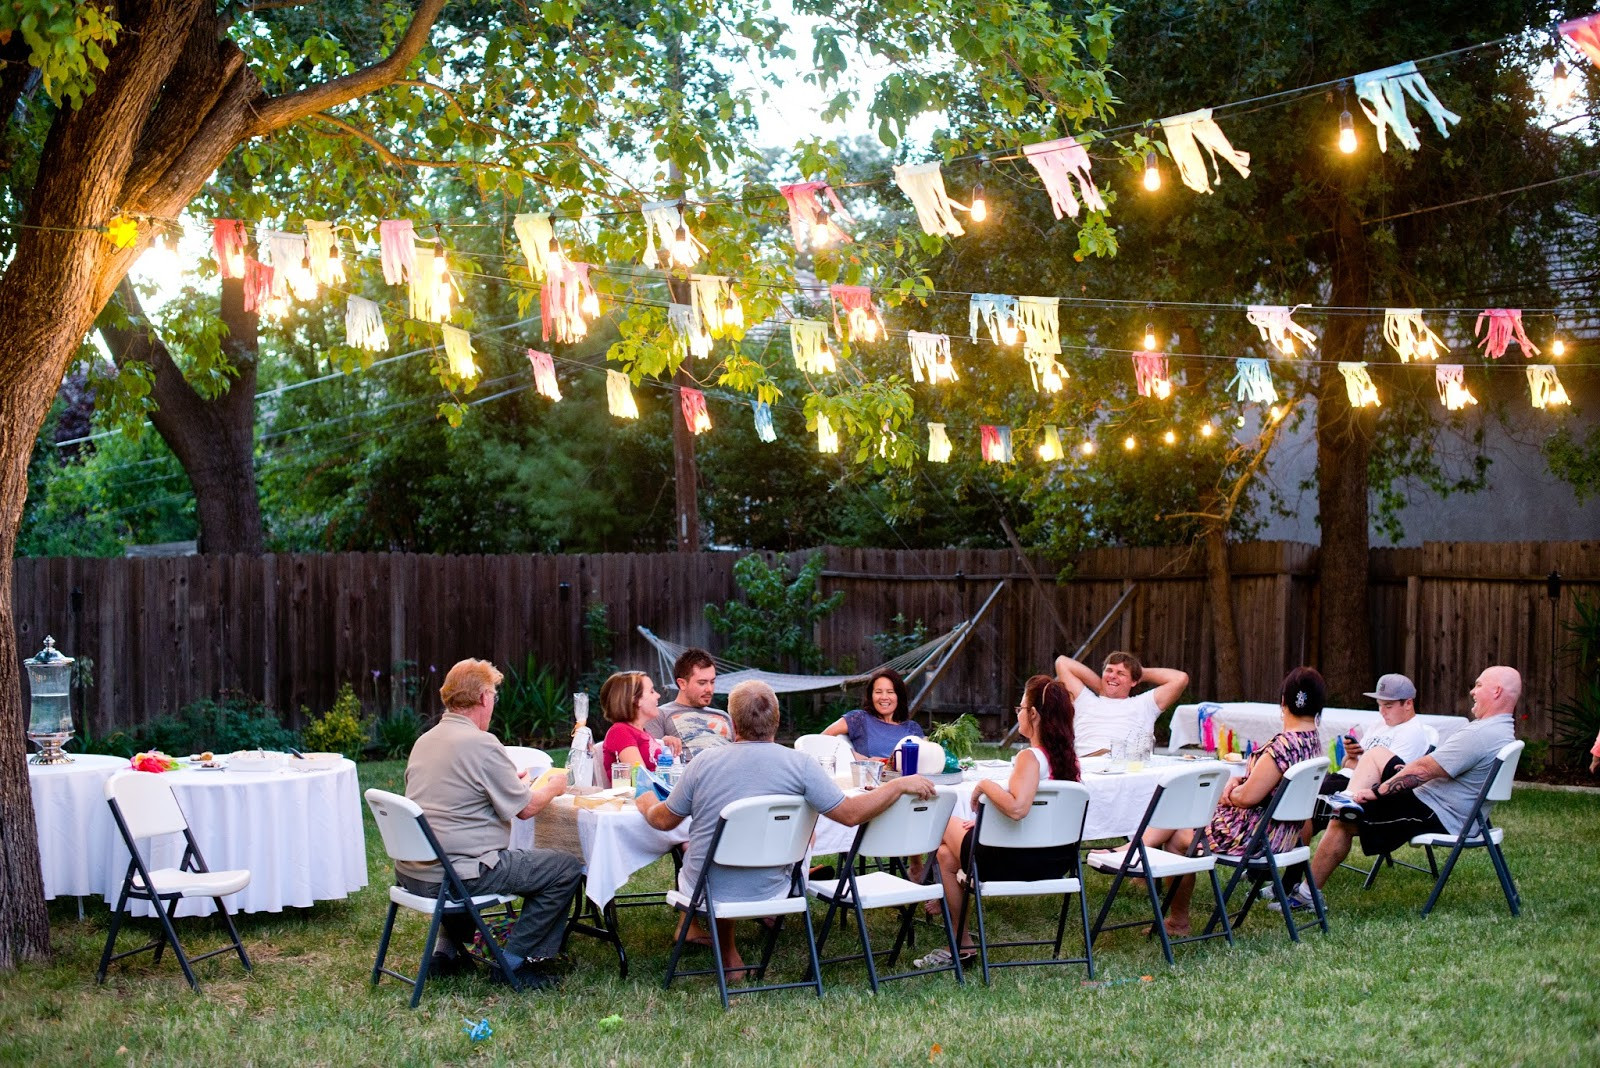 Fall Backyard Party Ideas  Domestic Fashionista Backyard Fall Celebration